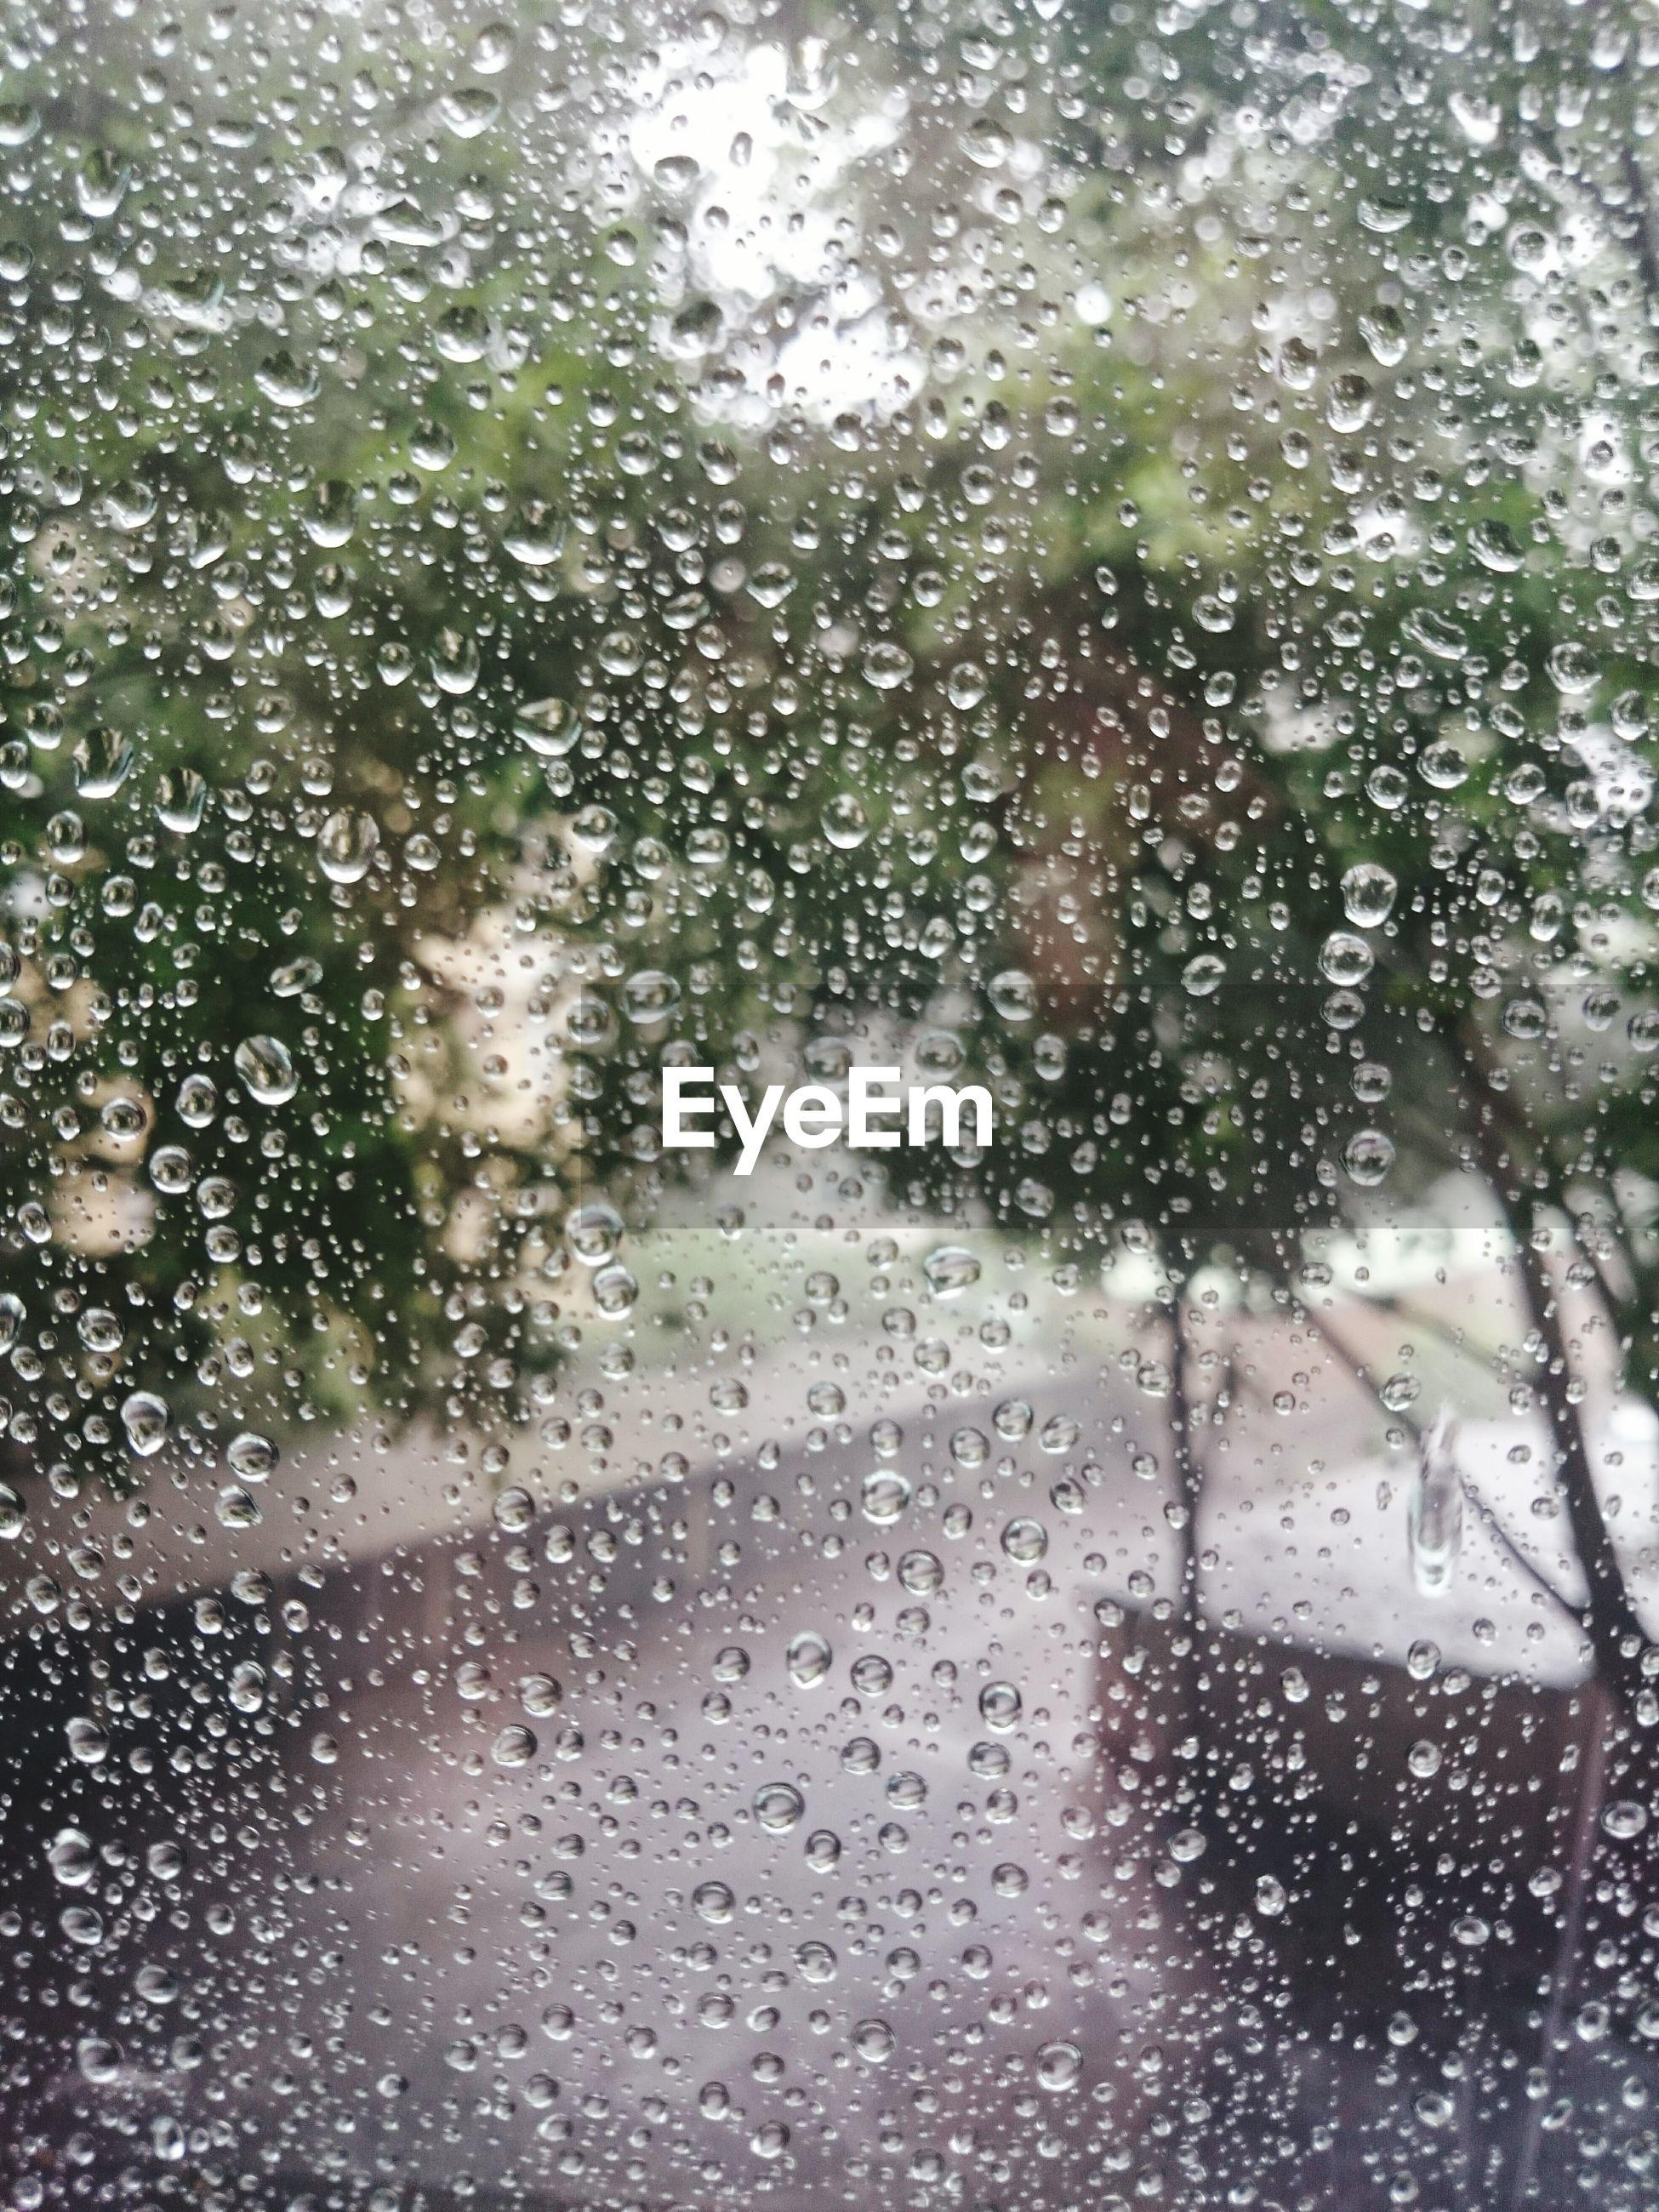 Trees seen through wet glass window on rainy day